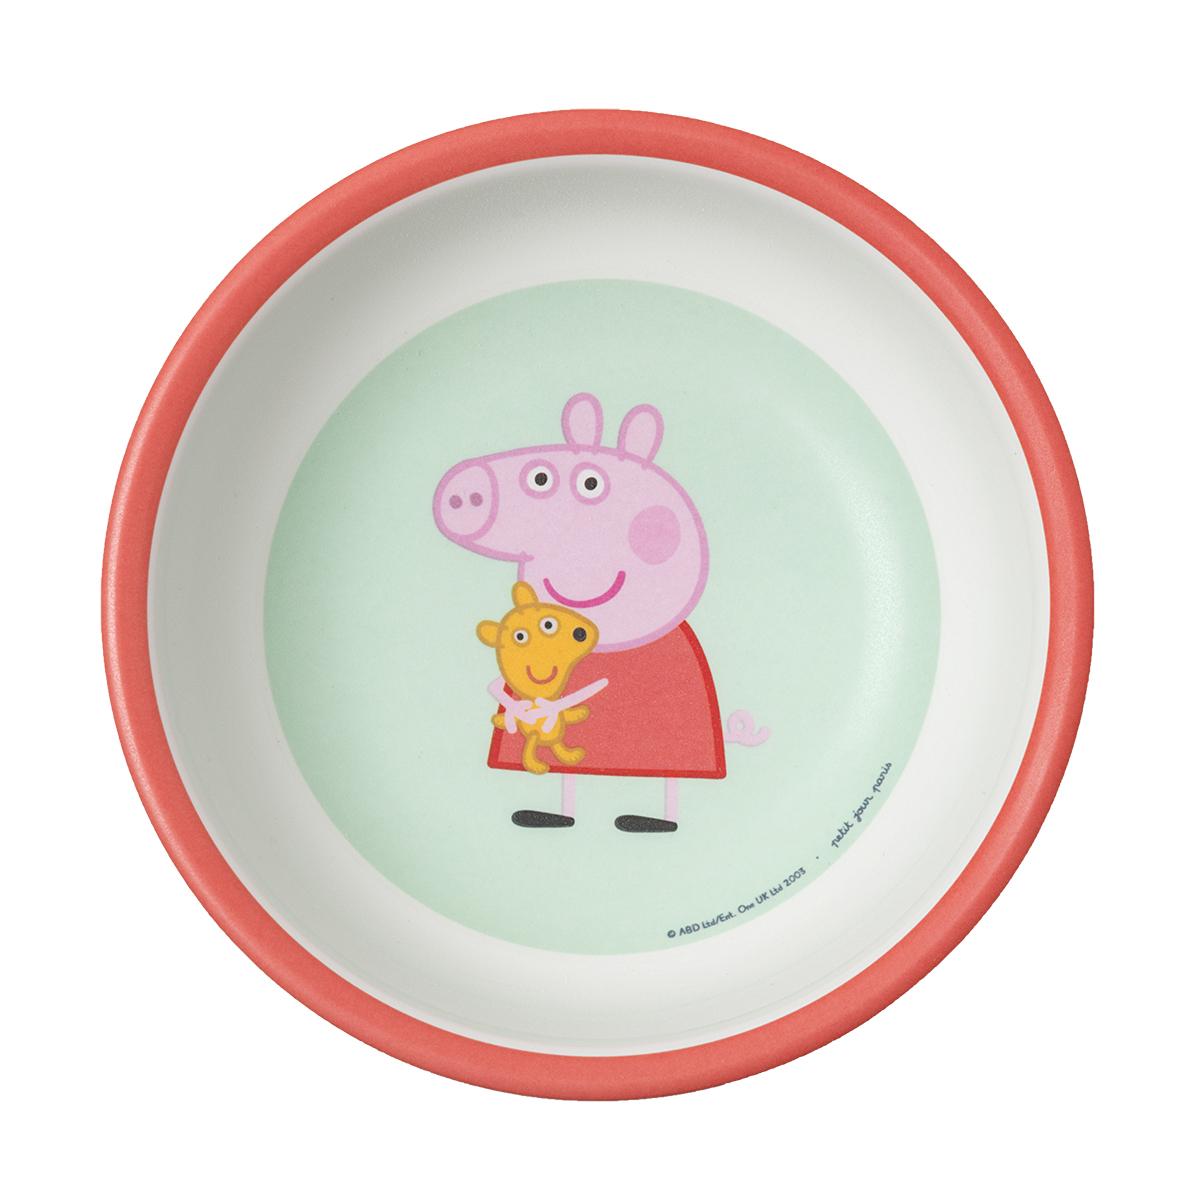 Bol Peppa Pig ROUGE petit jour paris